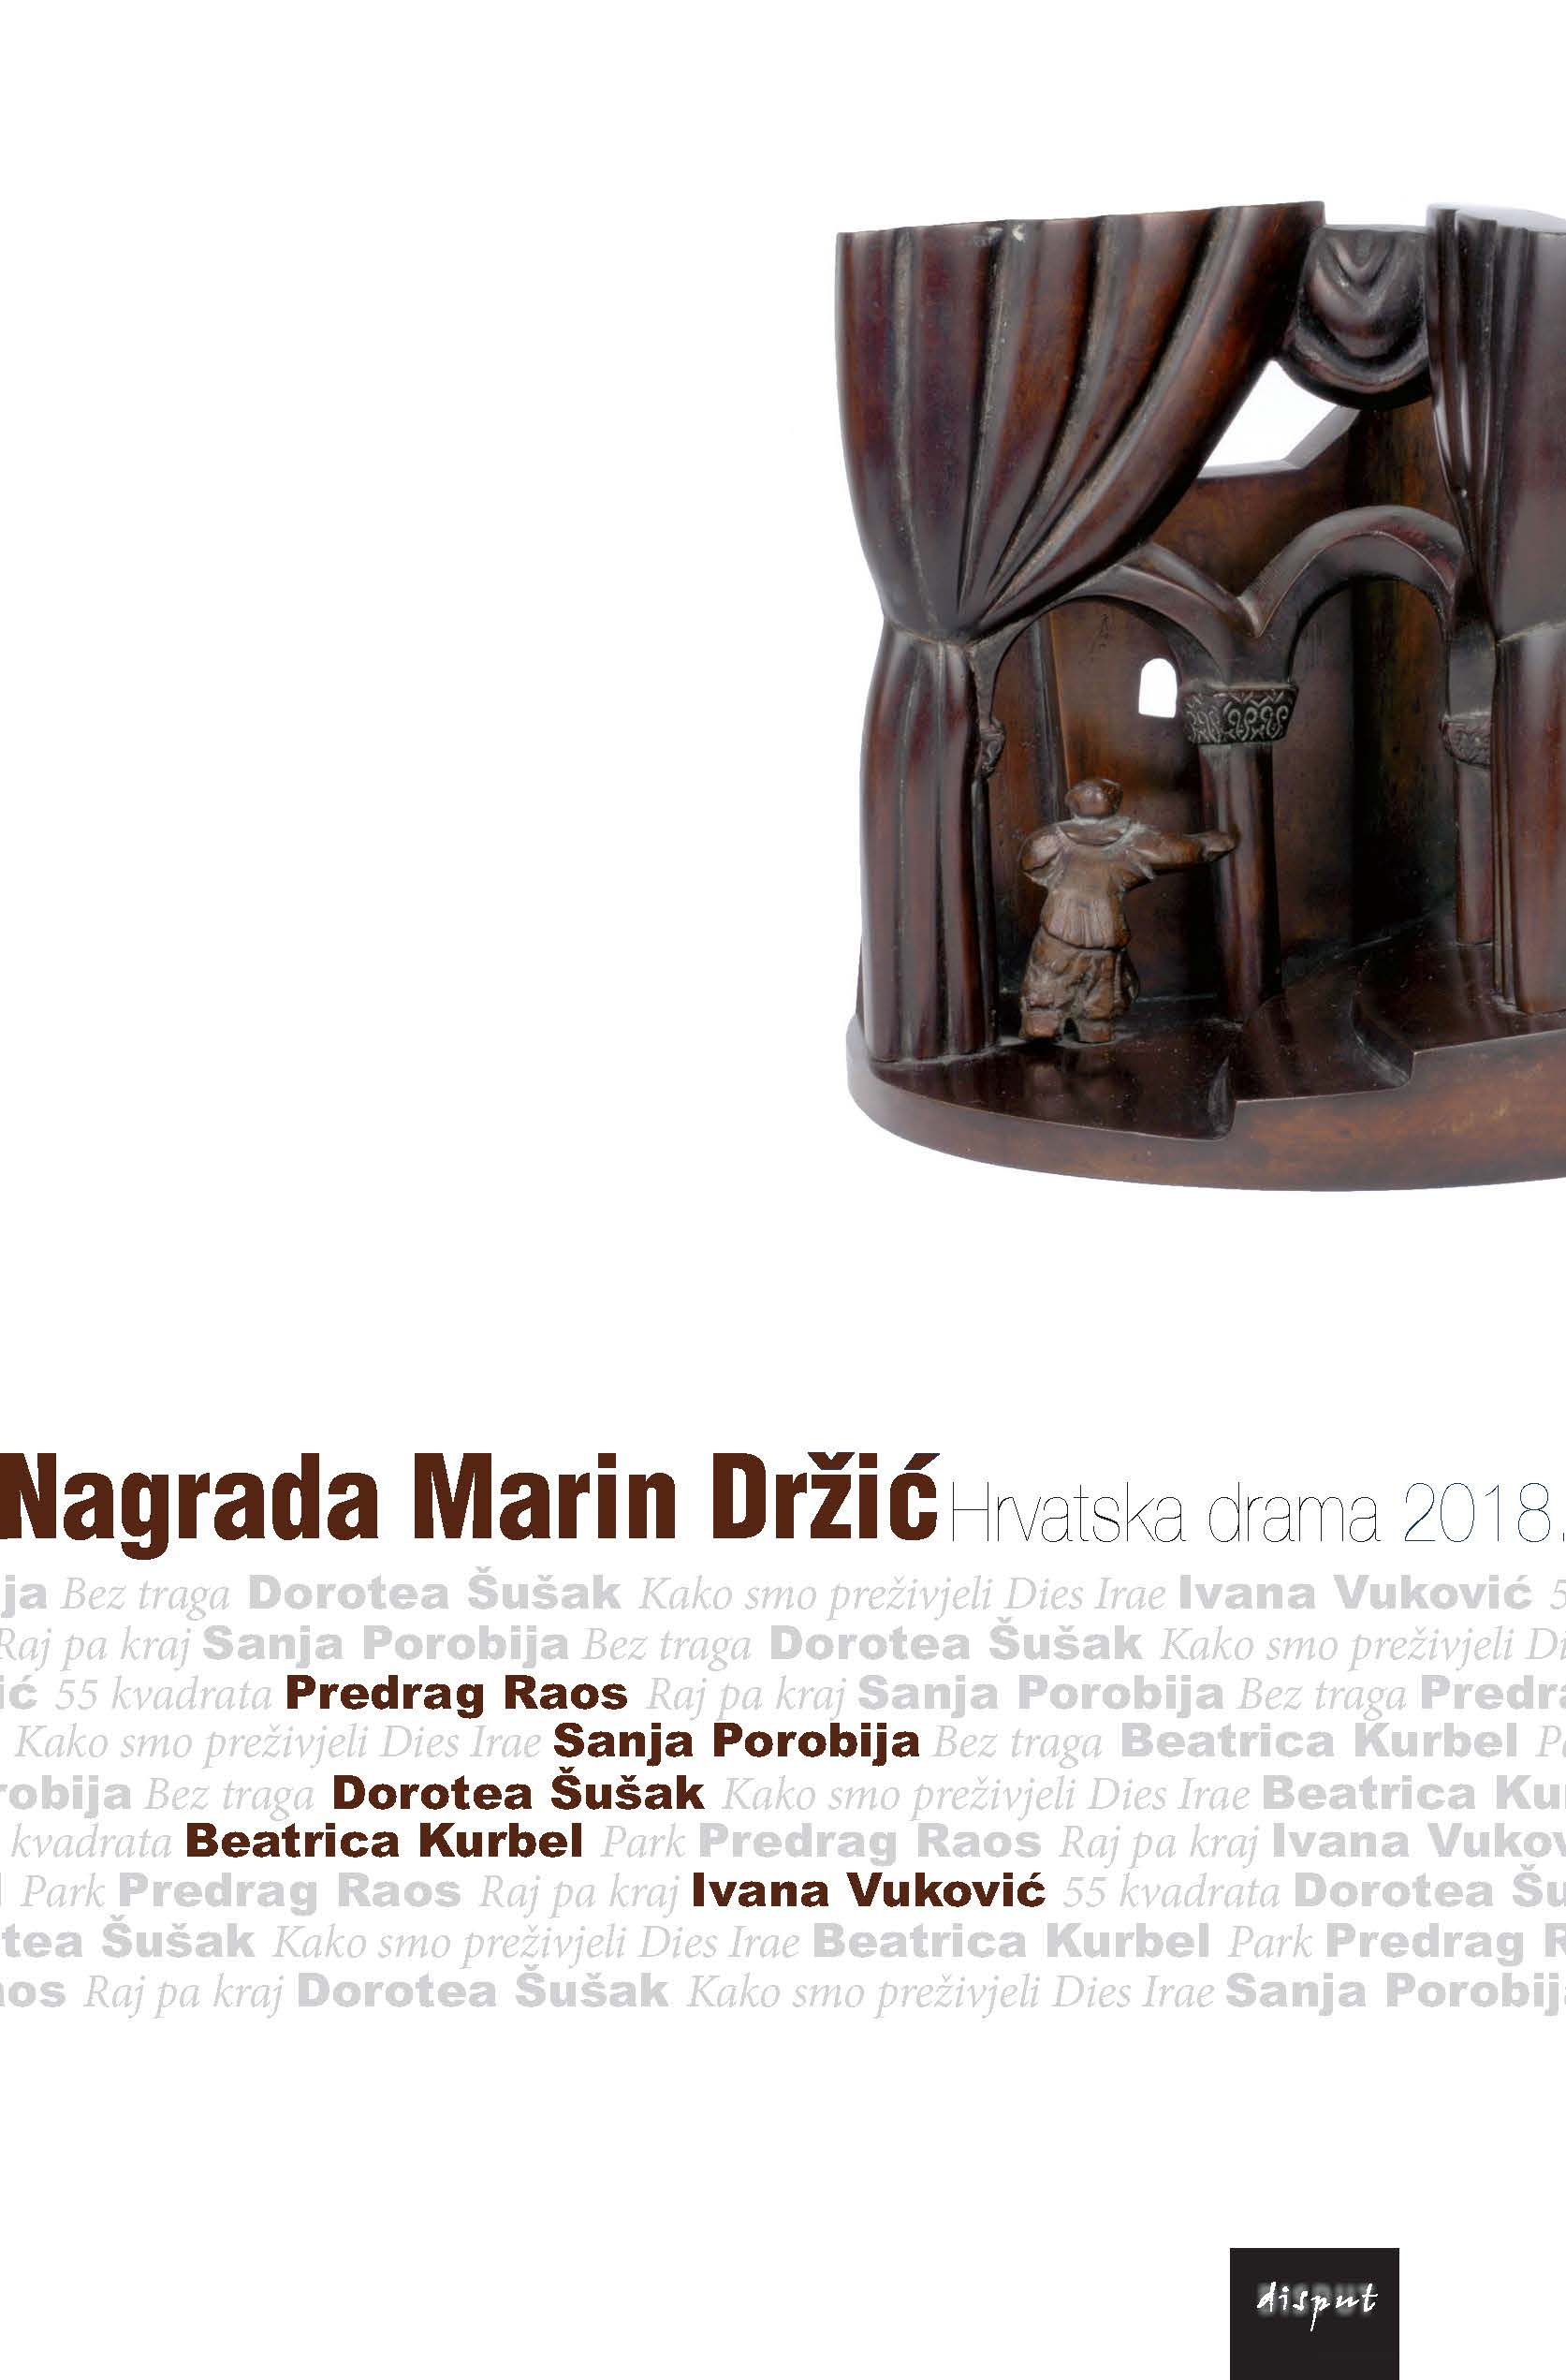 NAGRADA MARIN DRŽIĆ. Hrvatska drama 2018.